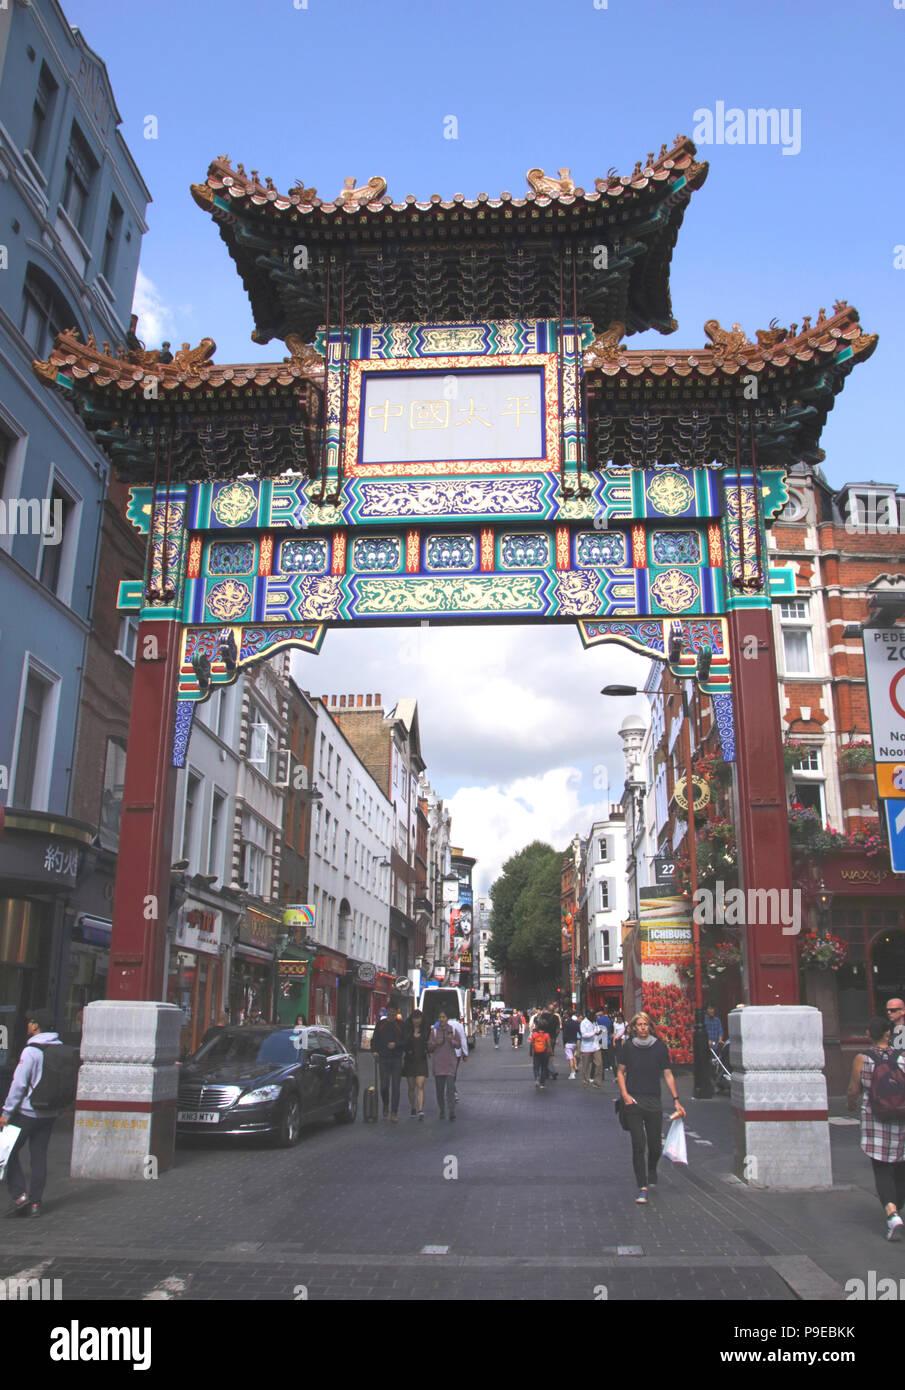 Chinatown gate at Wardour Street London - Stock Image